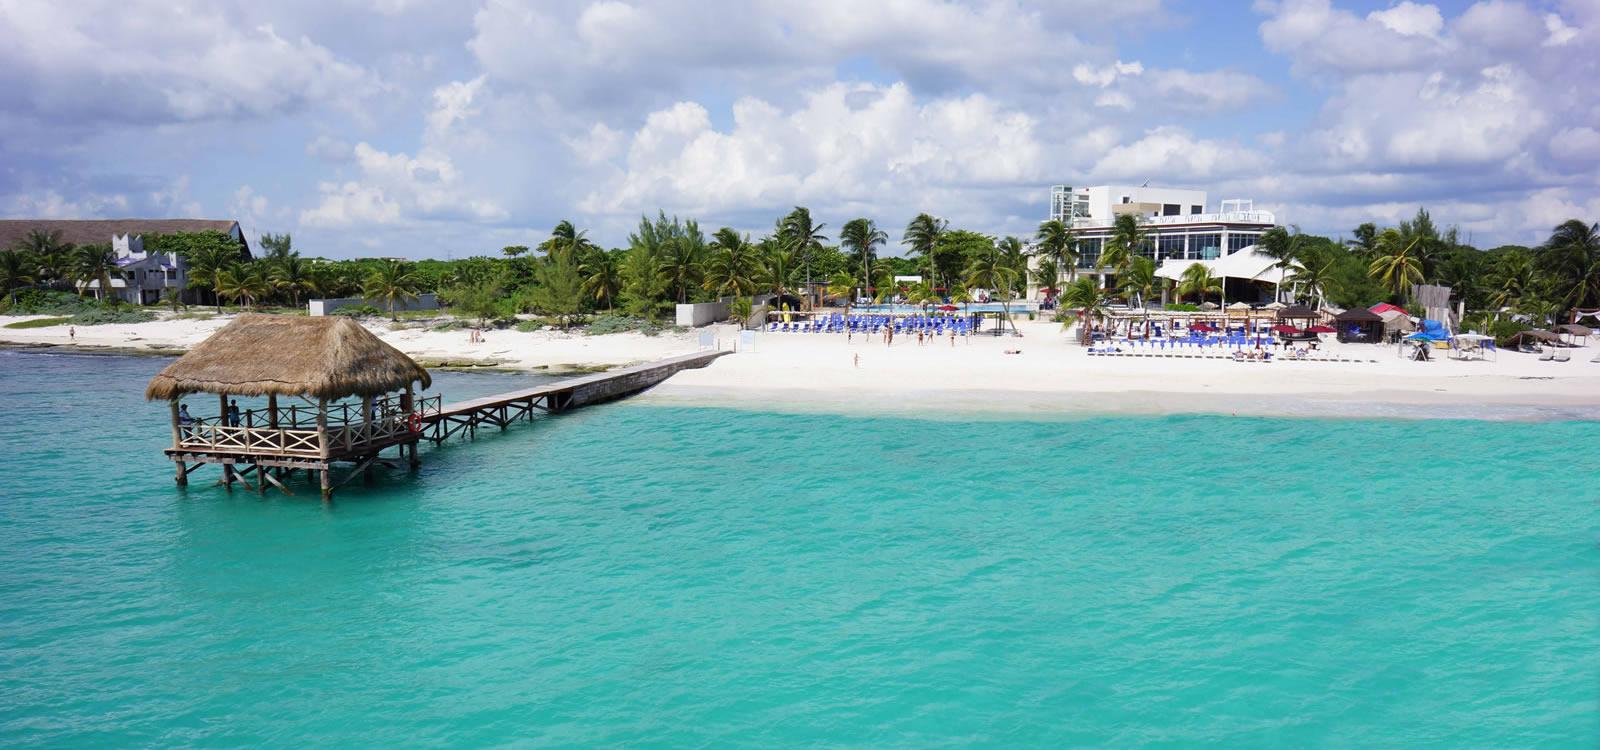 Playa Del Carmen Condos For Sale On The Beach